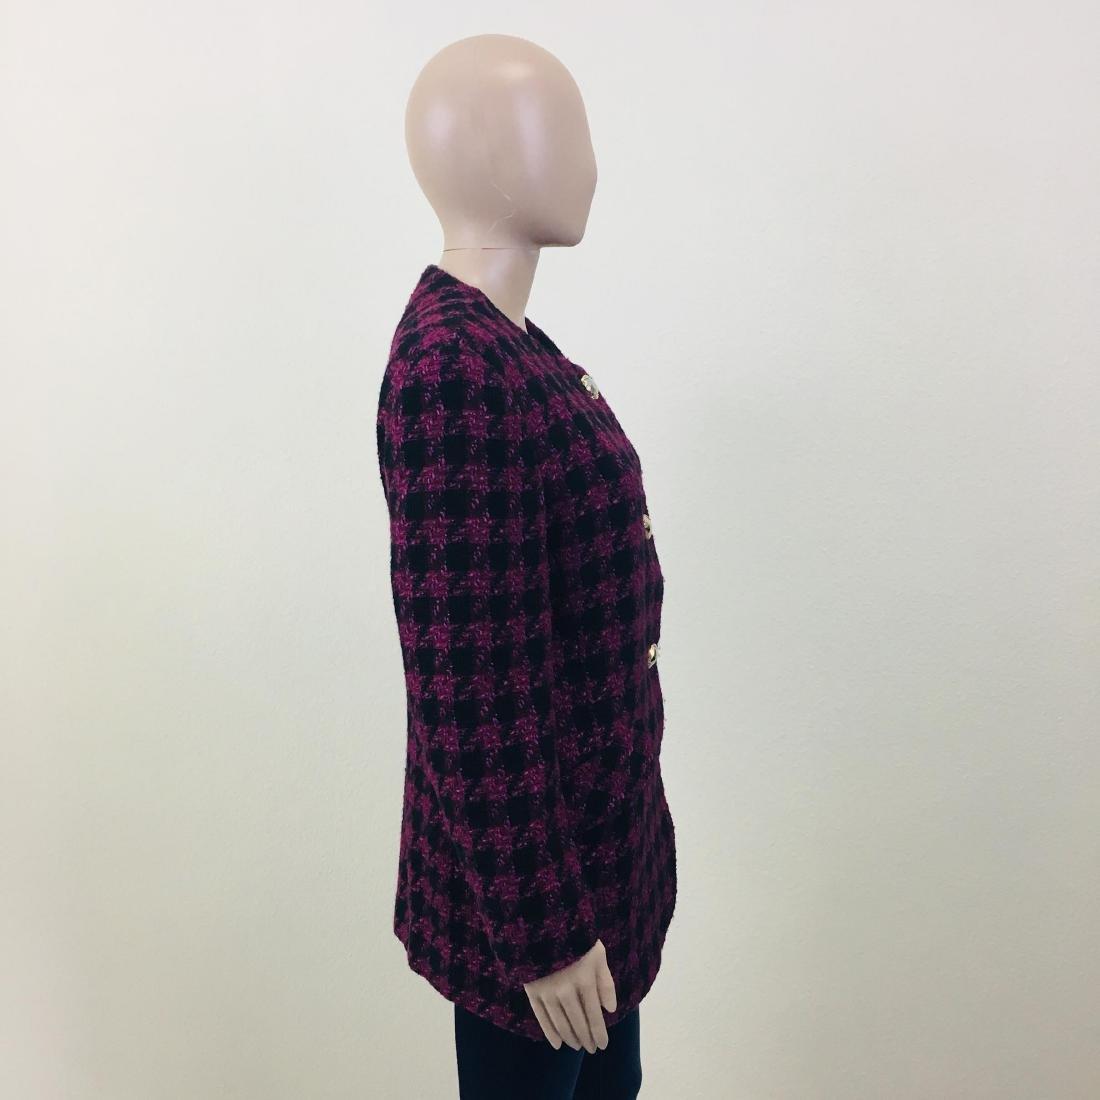 Vintage Women's Uknown Italian Designer Wool Blend - 6